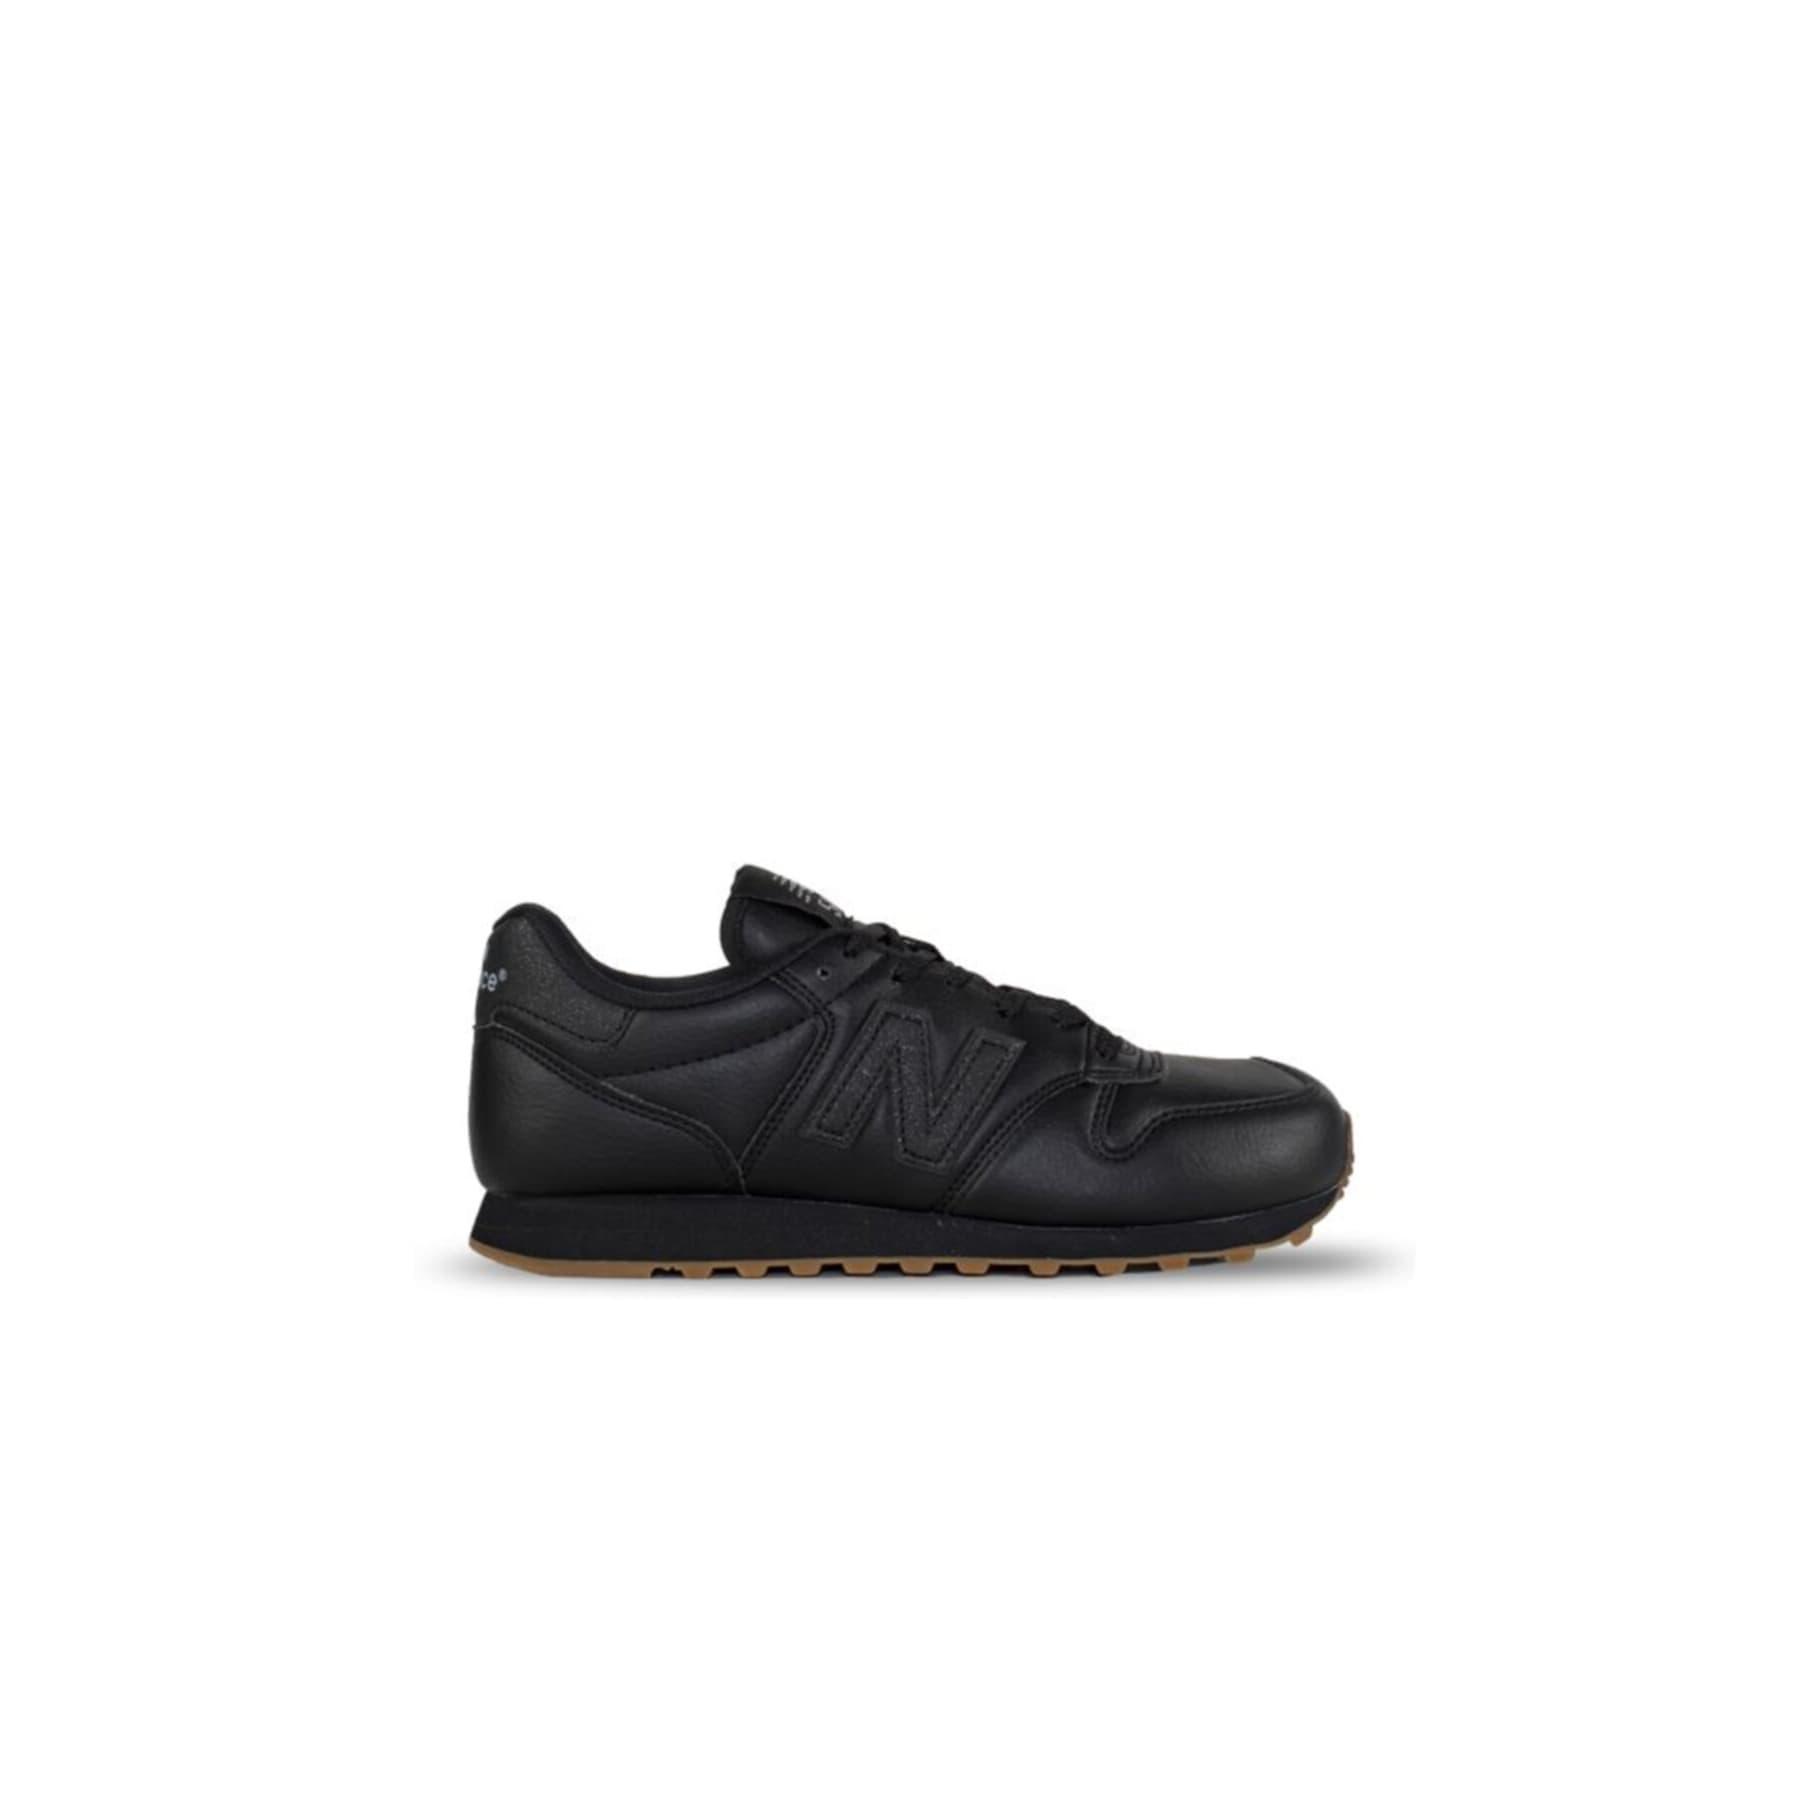 500 Kadın Siyah Spor Ayakkabı (GW500TLL)